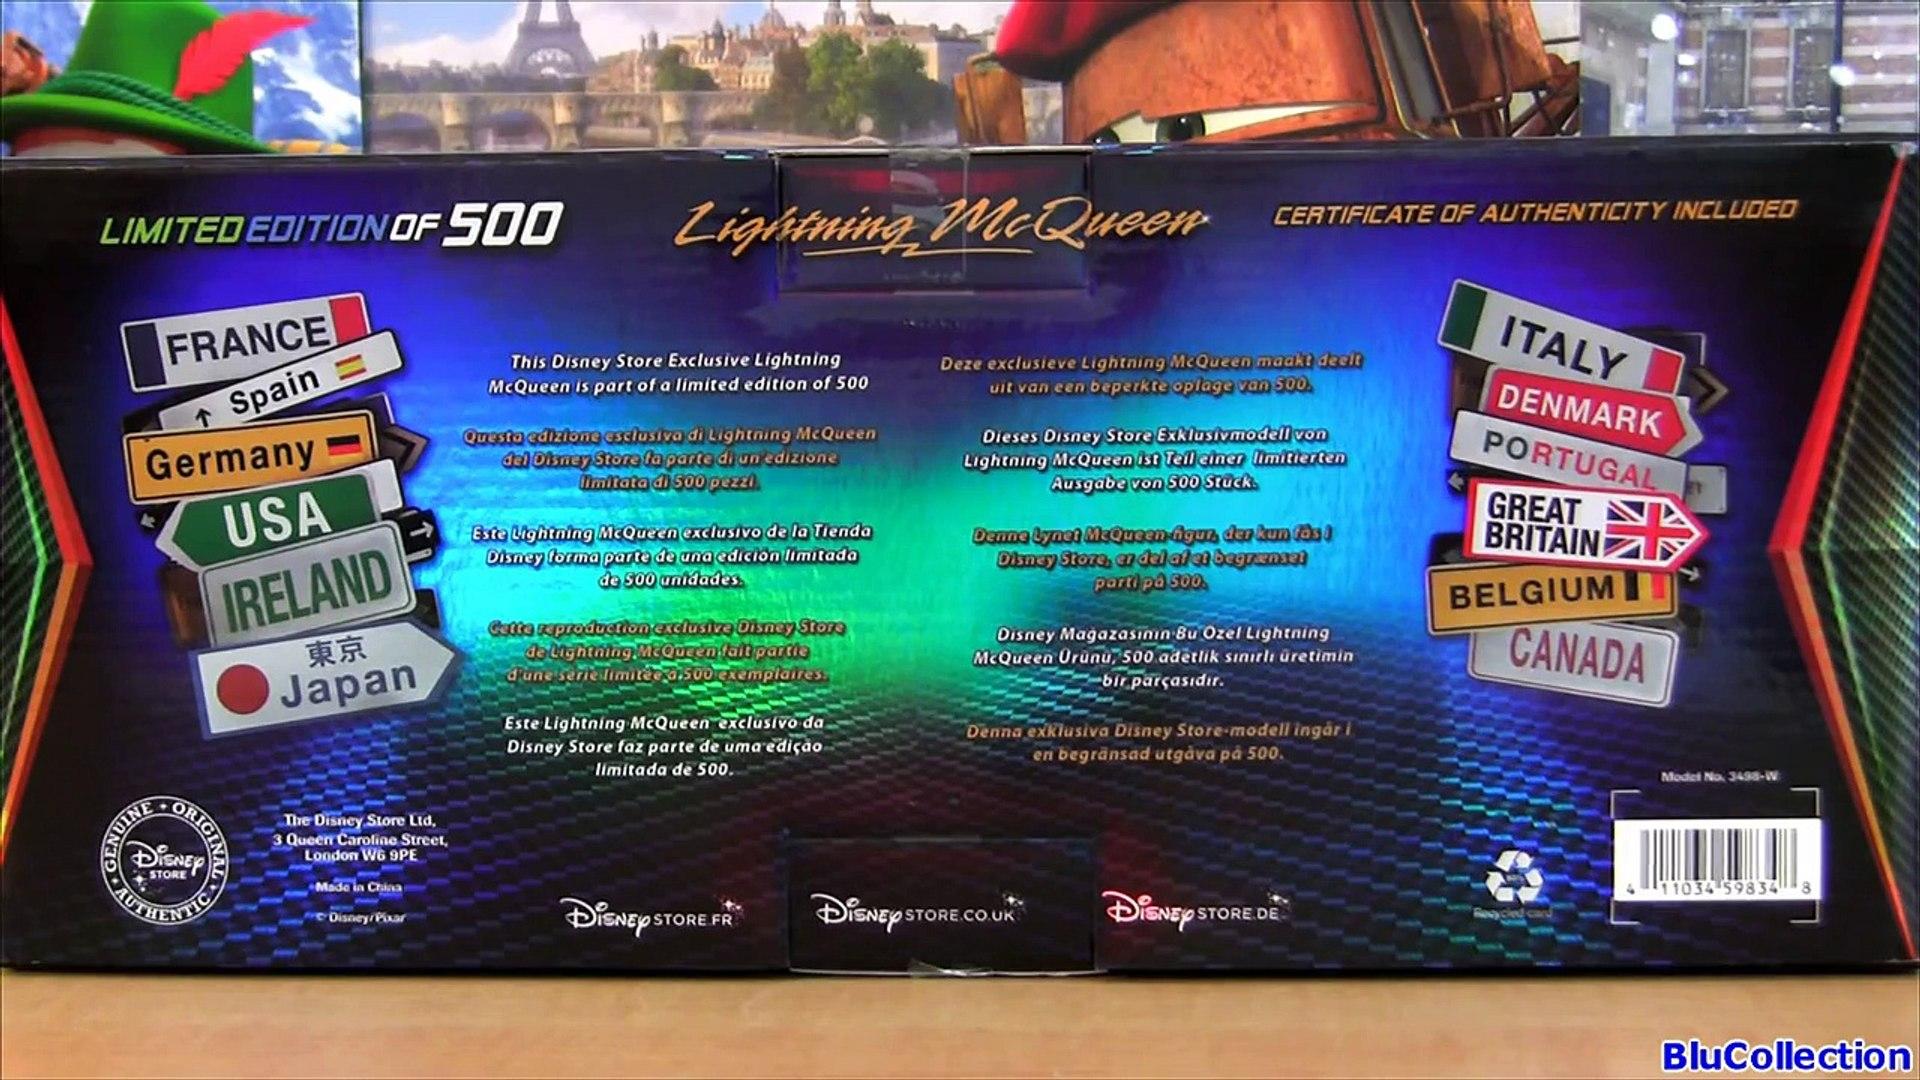 Limited Edition Chrome Lightning McQueen World Grand Prix CARS 2 International Silver Metallic car